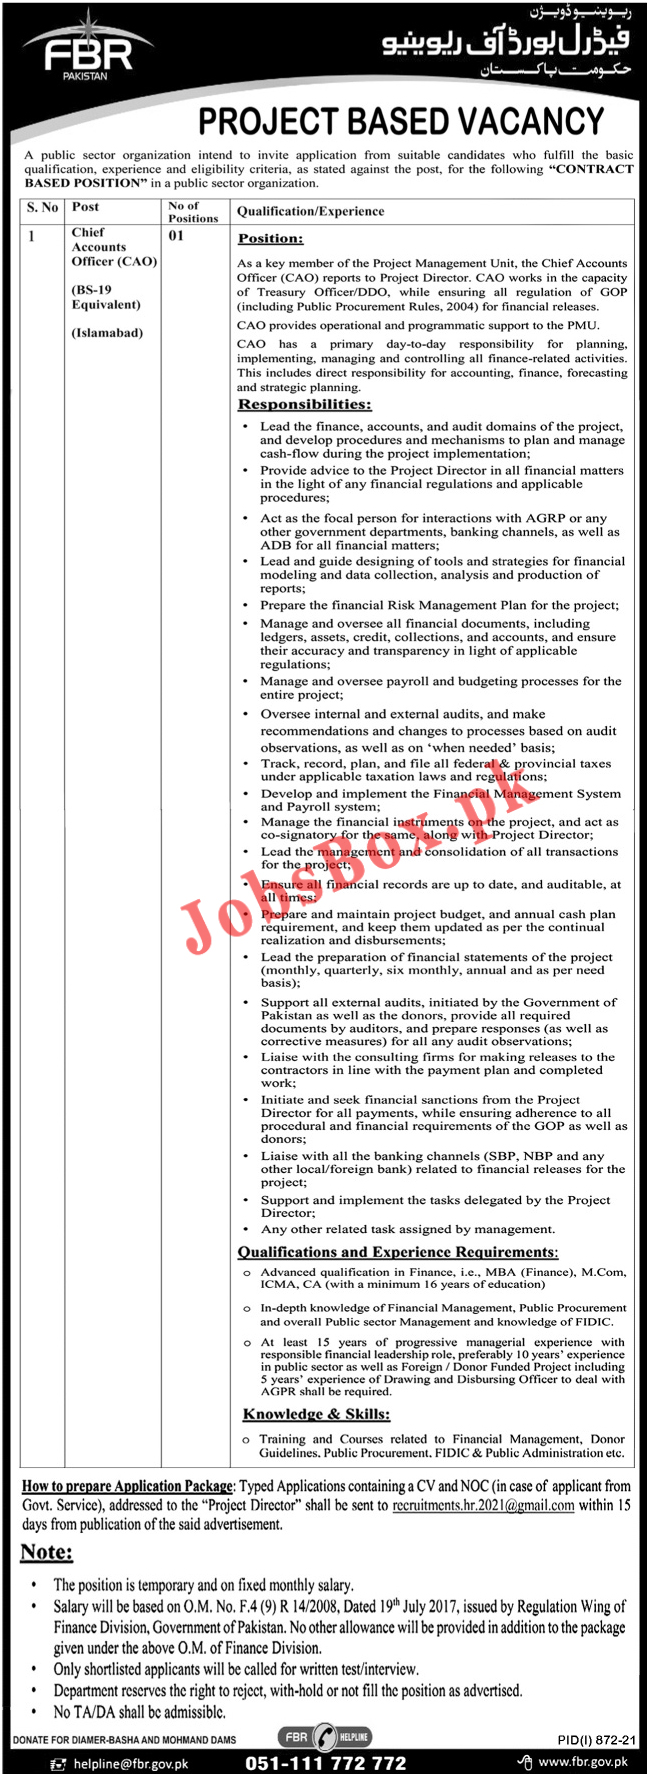 recruitments.hr.2021@gmail.com - Federal Board of Revenue FBR Jobs 2021 in Pakistan